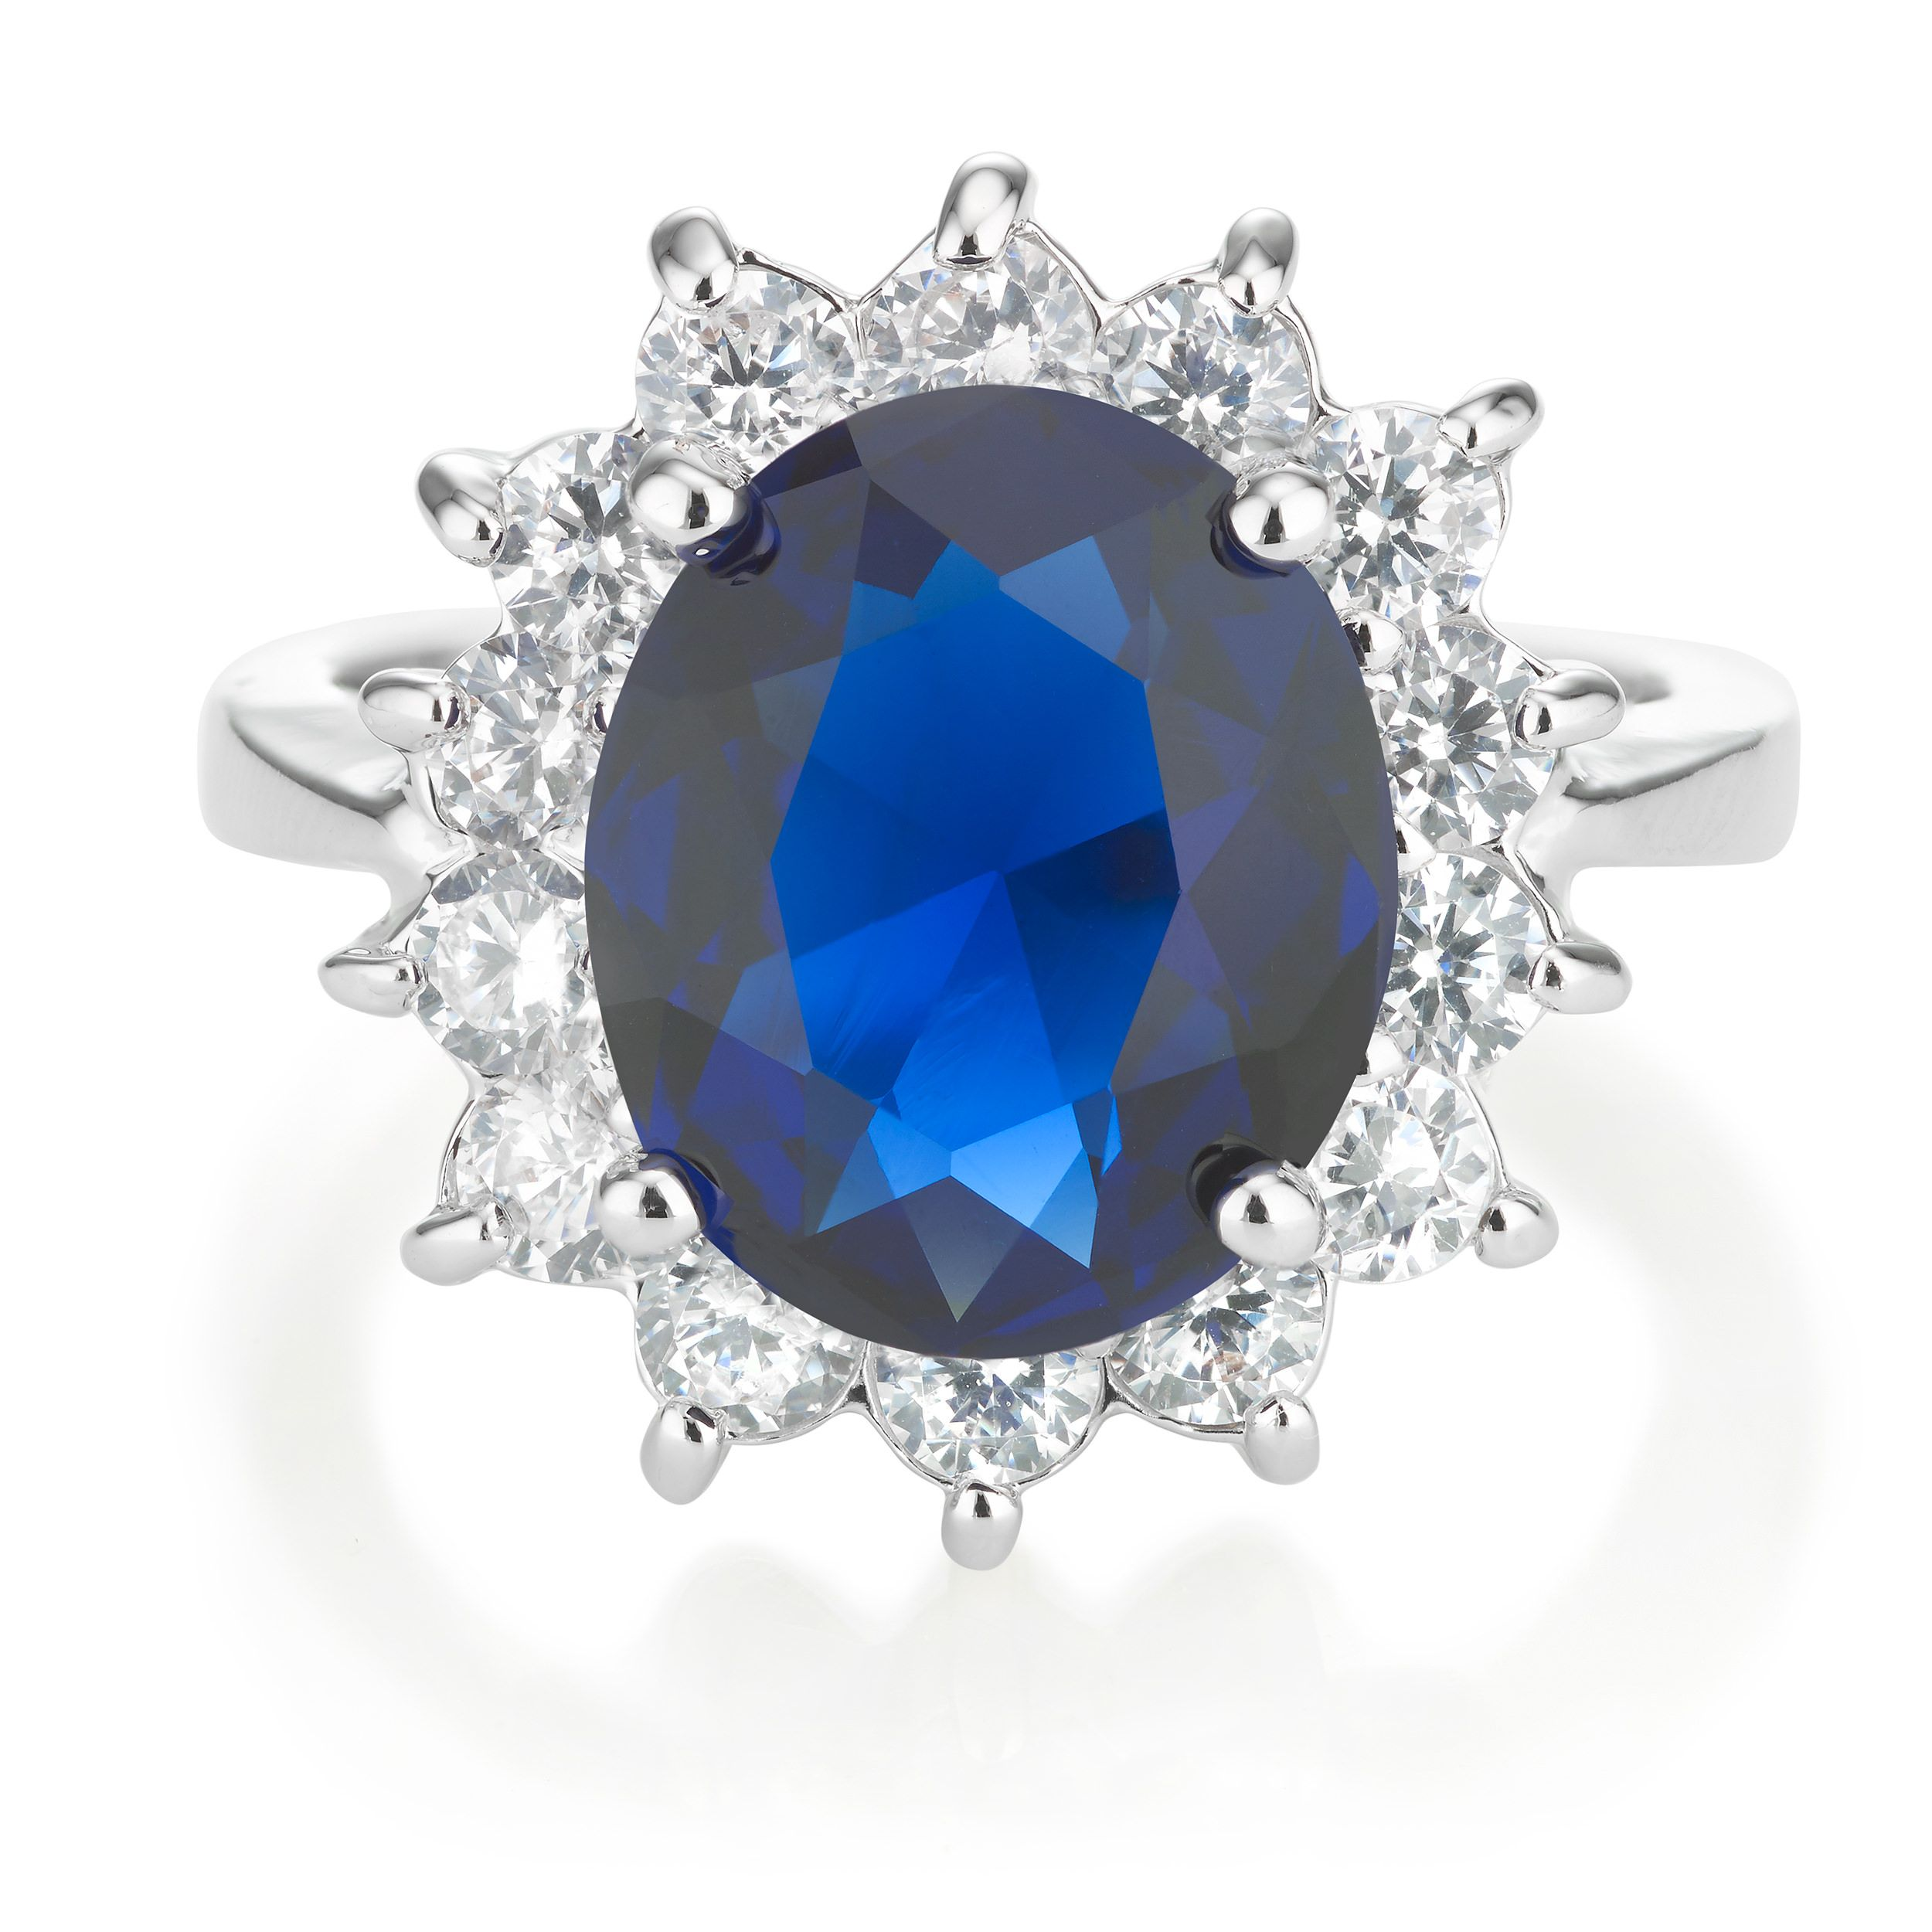 Buckley London Royal Celebration Blue Ring